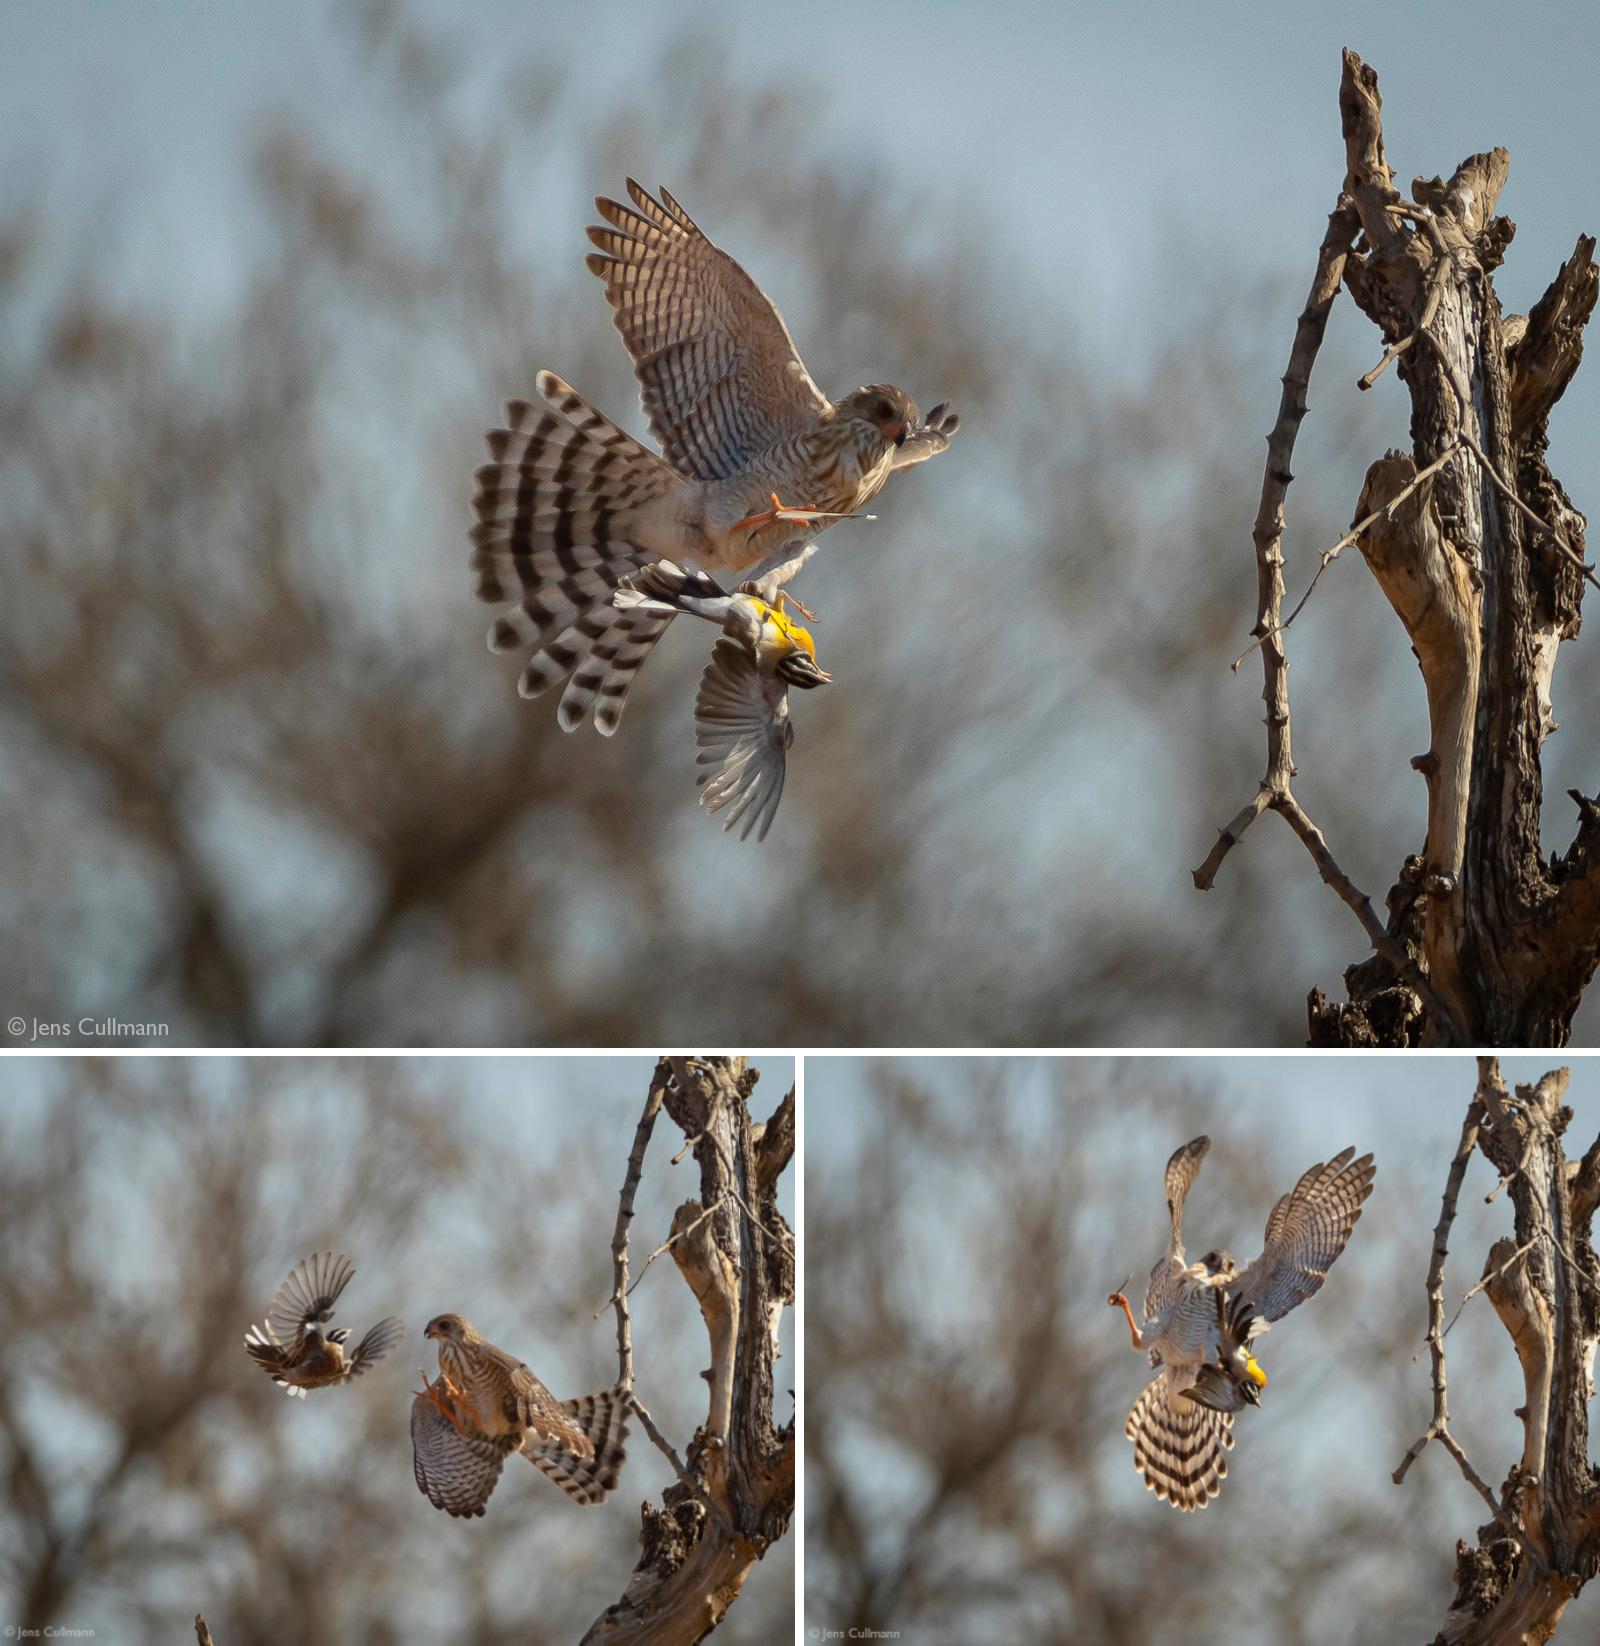 Gabar goshawk catching bird in Klaserie Private Nature Reserve, South Africa